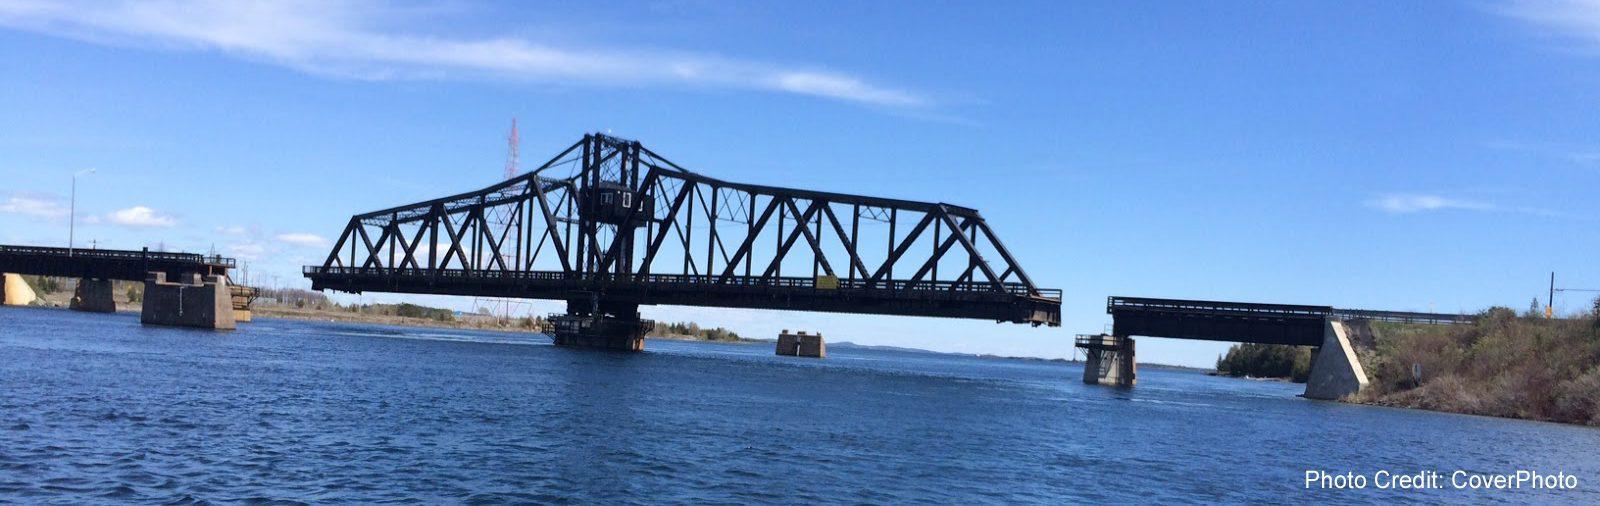 Little Current, Manitouline - Swing Bridge open- sliver (Cover Photo)